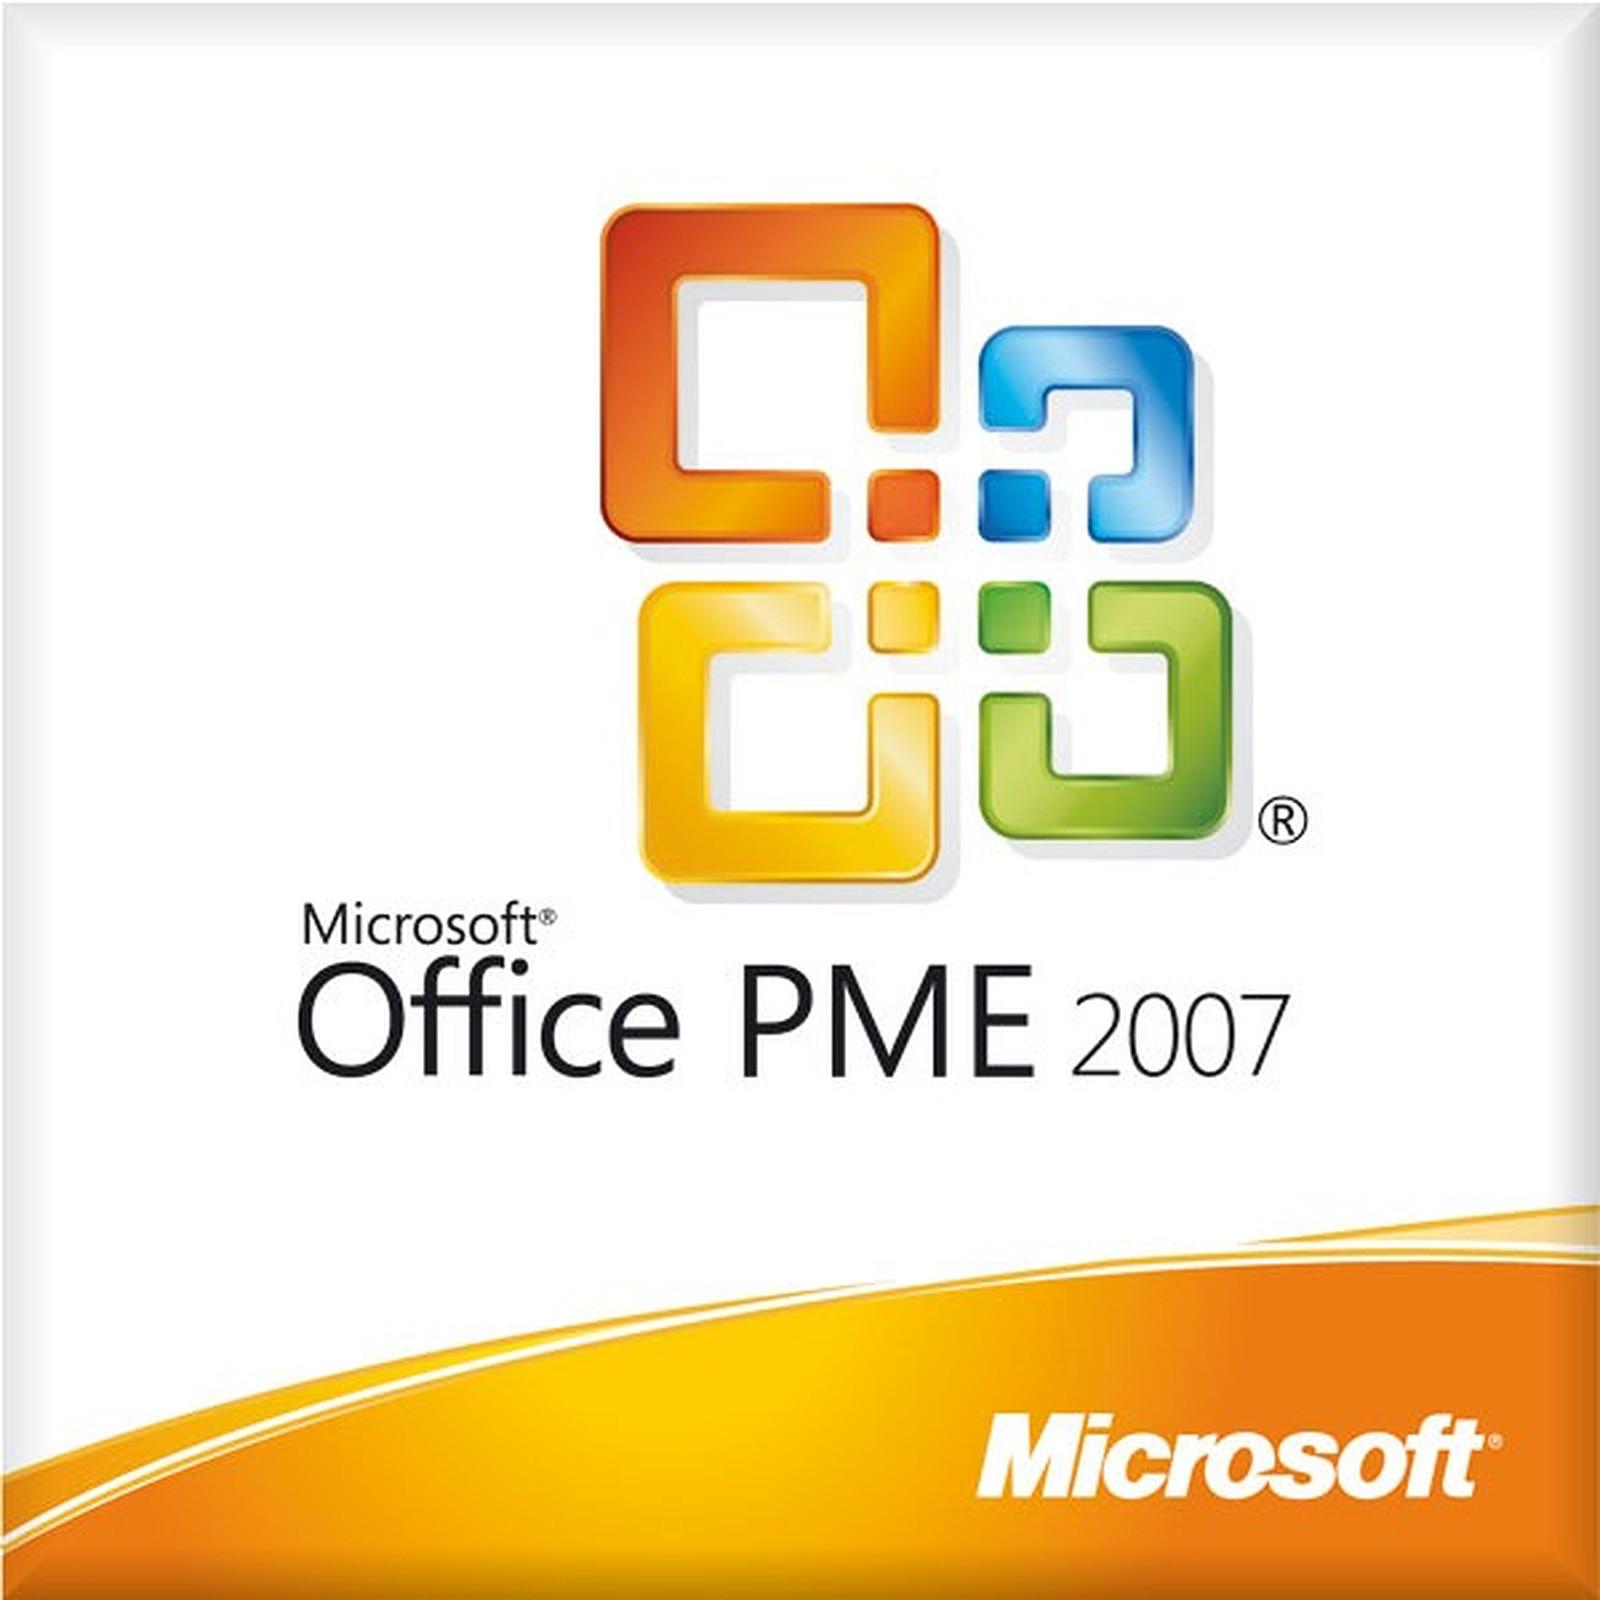 microsoft office famille et etudiant 2007 download